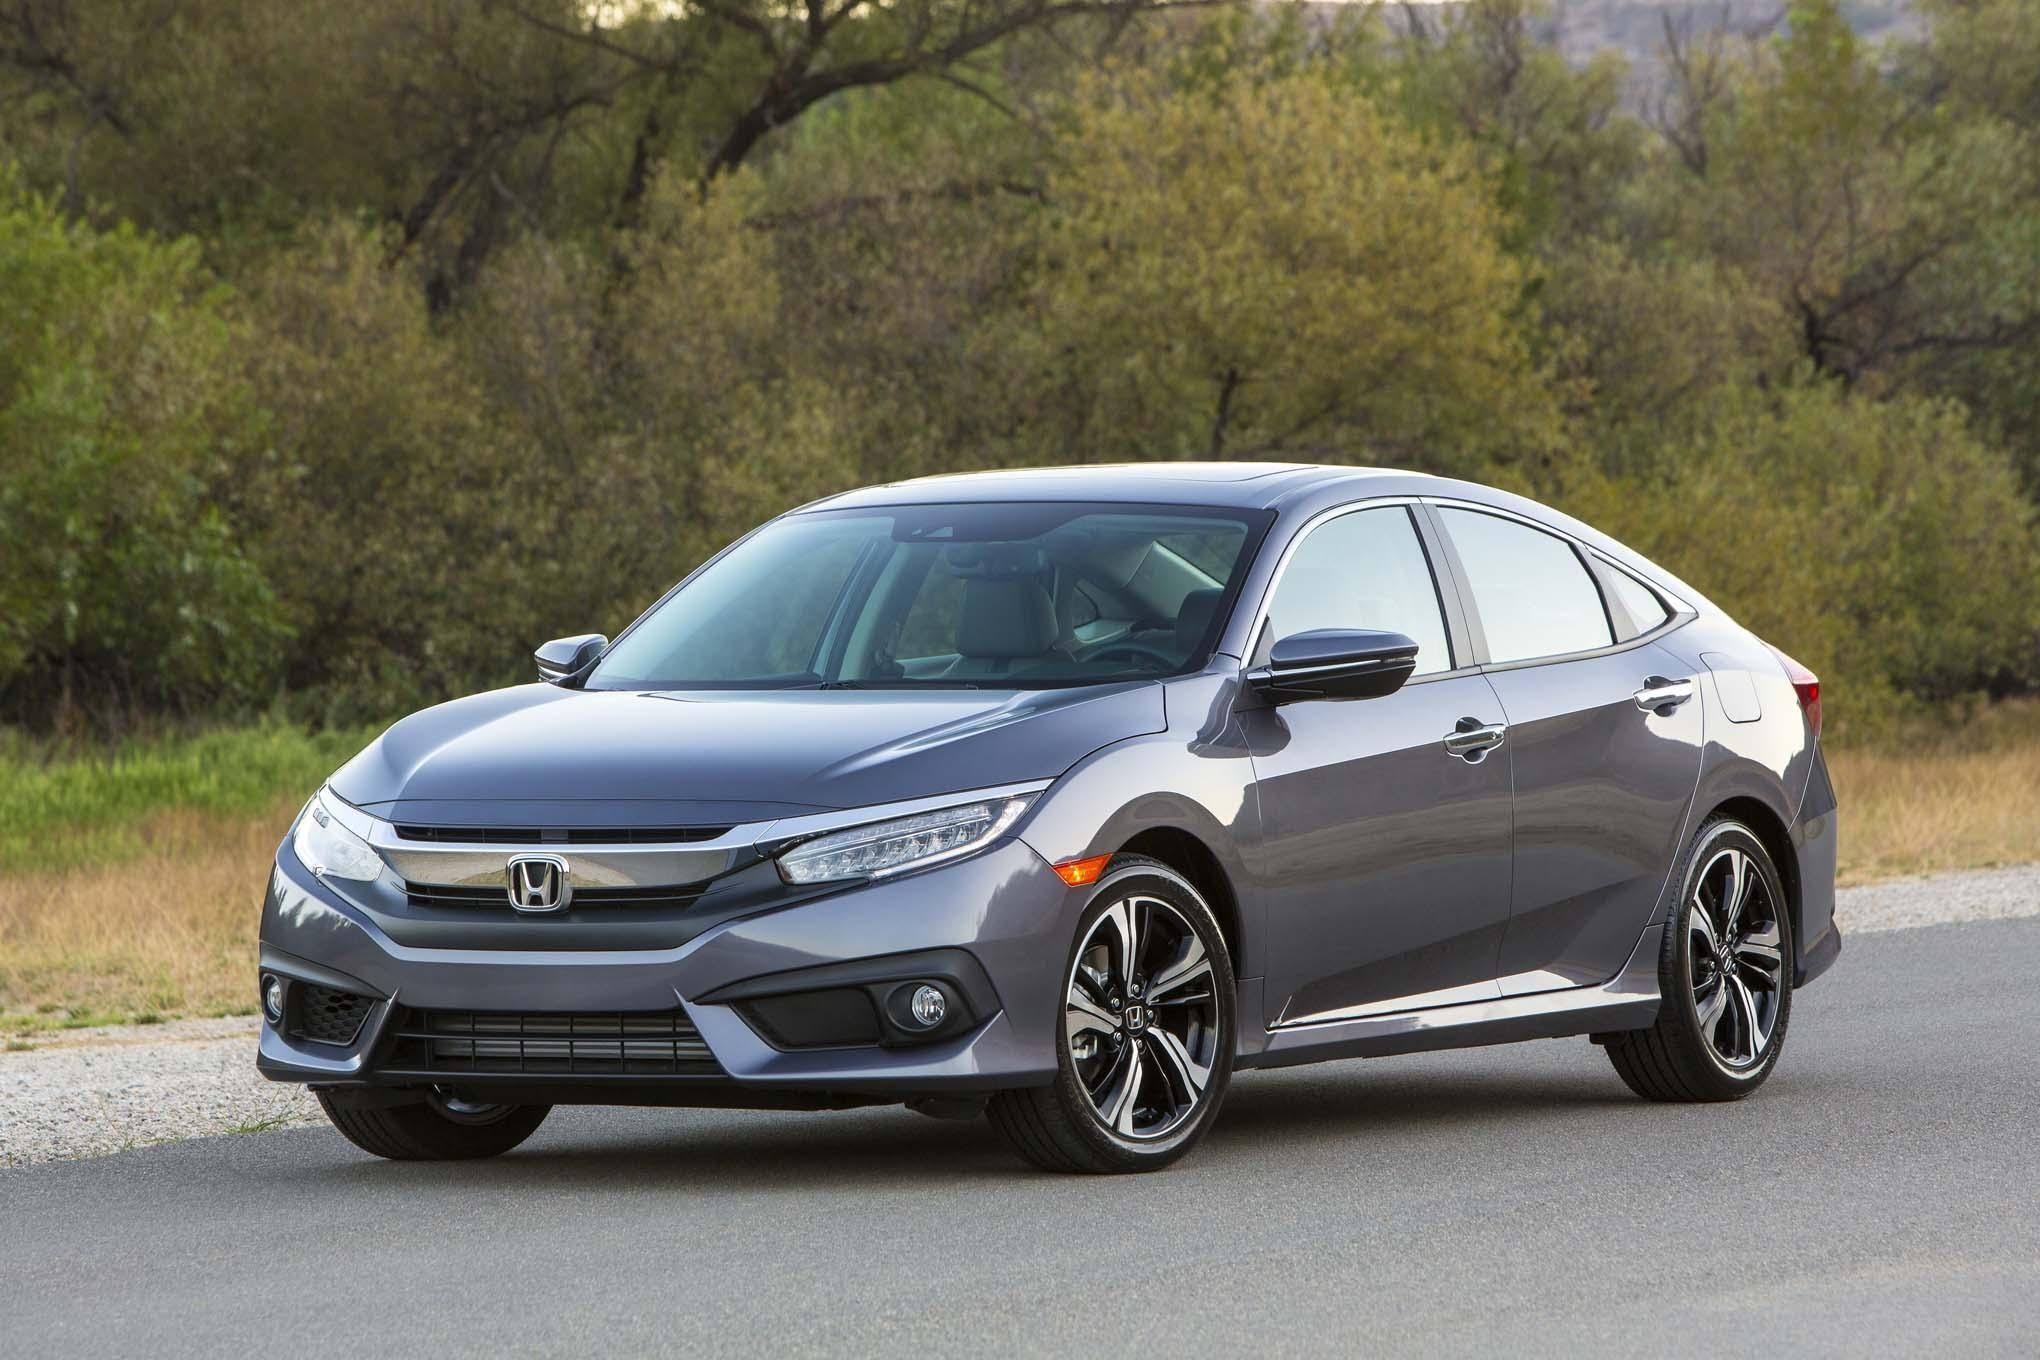 2019 Honda Civic Lx Price Car Review 2018 Honda civic